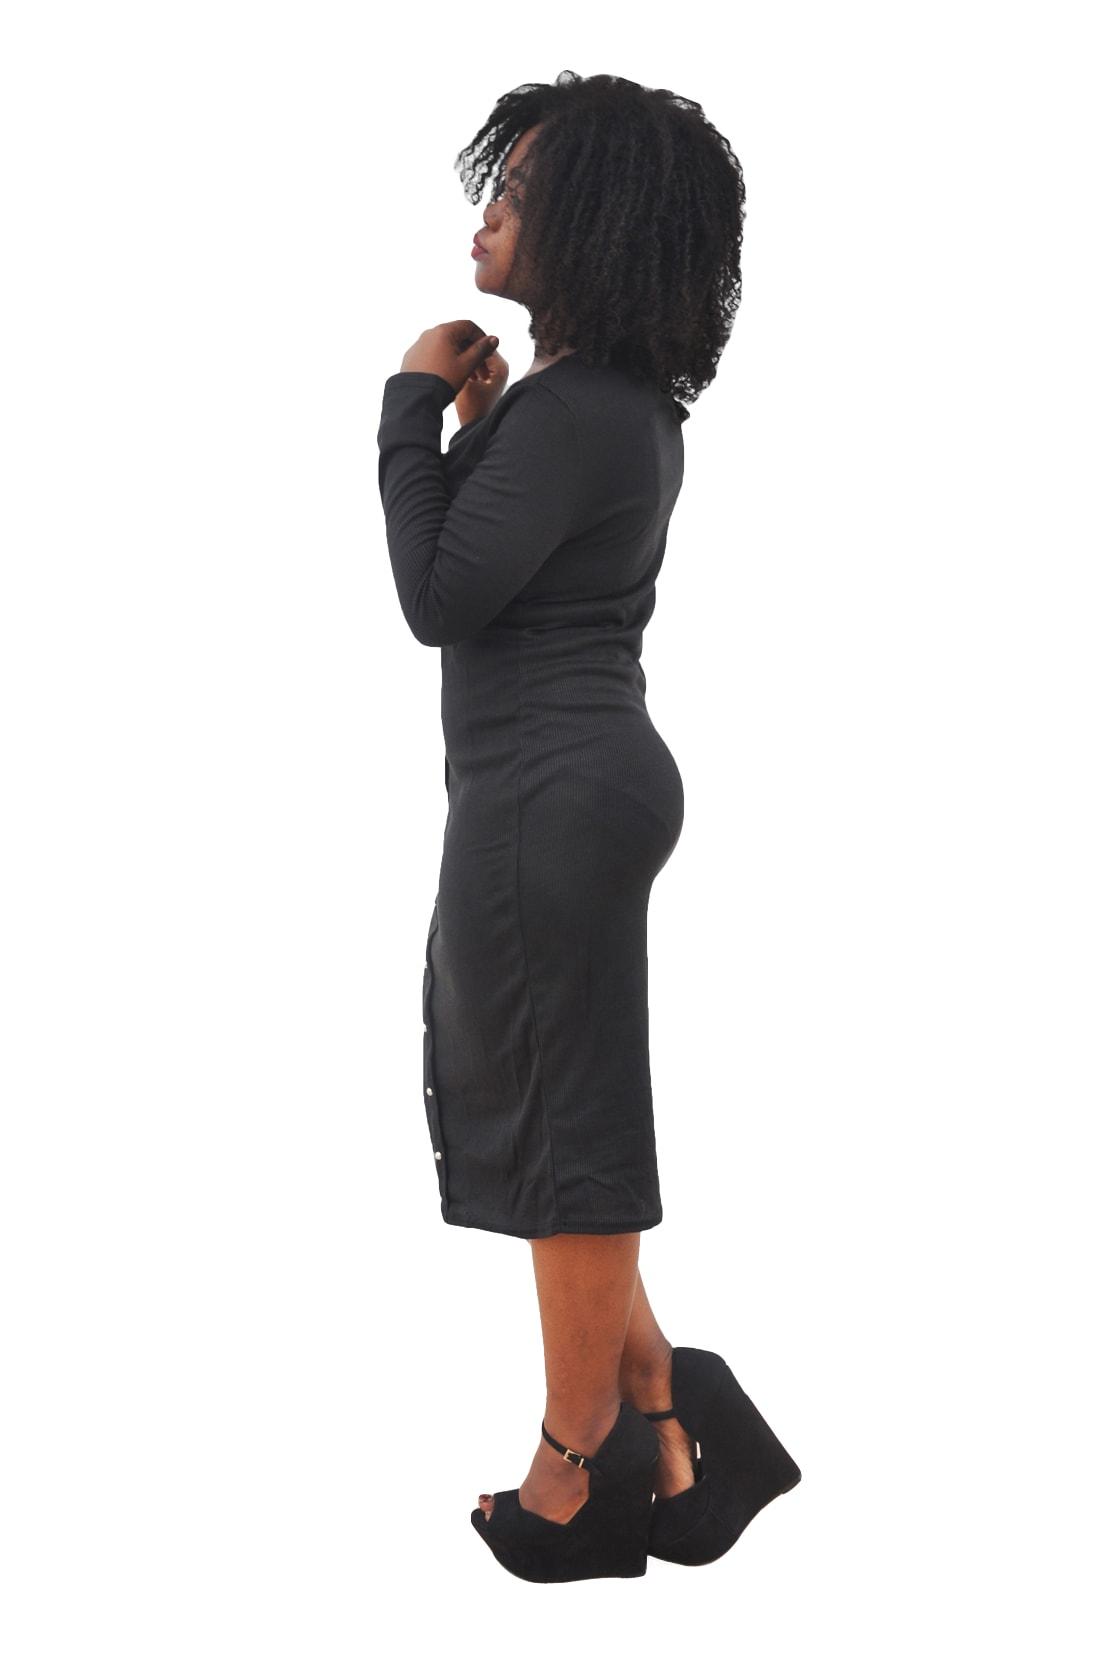 M0253 black2 Office Evening Dresses maureens.com boutique